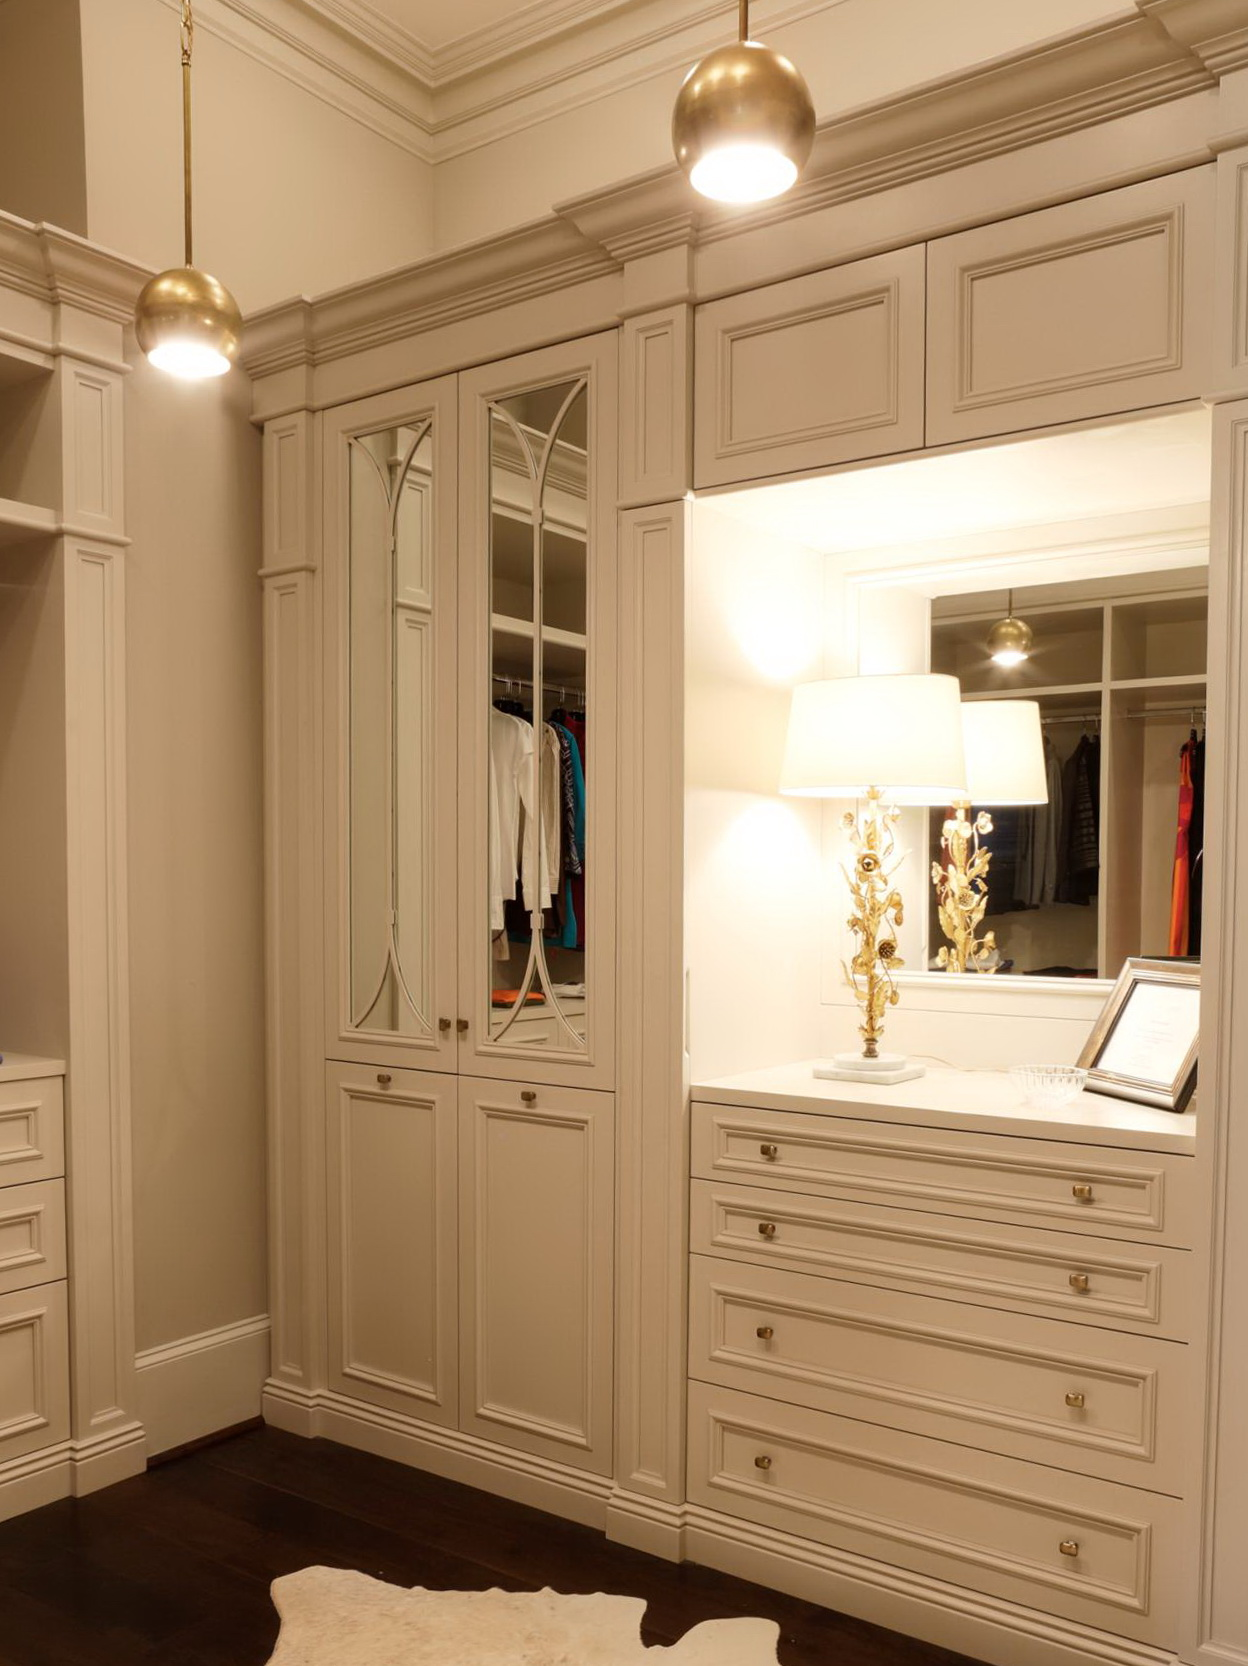 Master bedroom closet cabinets home design ideas - Master bedroom closet ideas ...